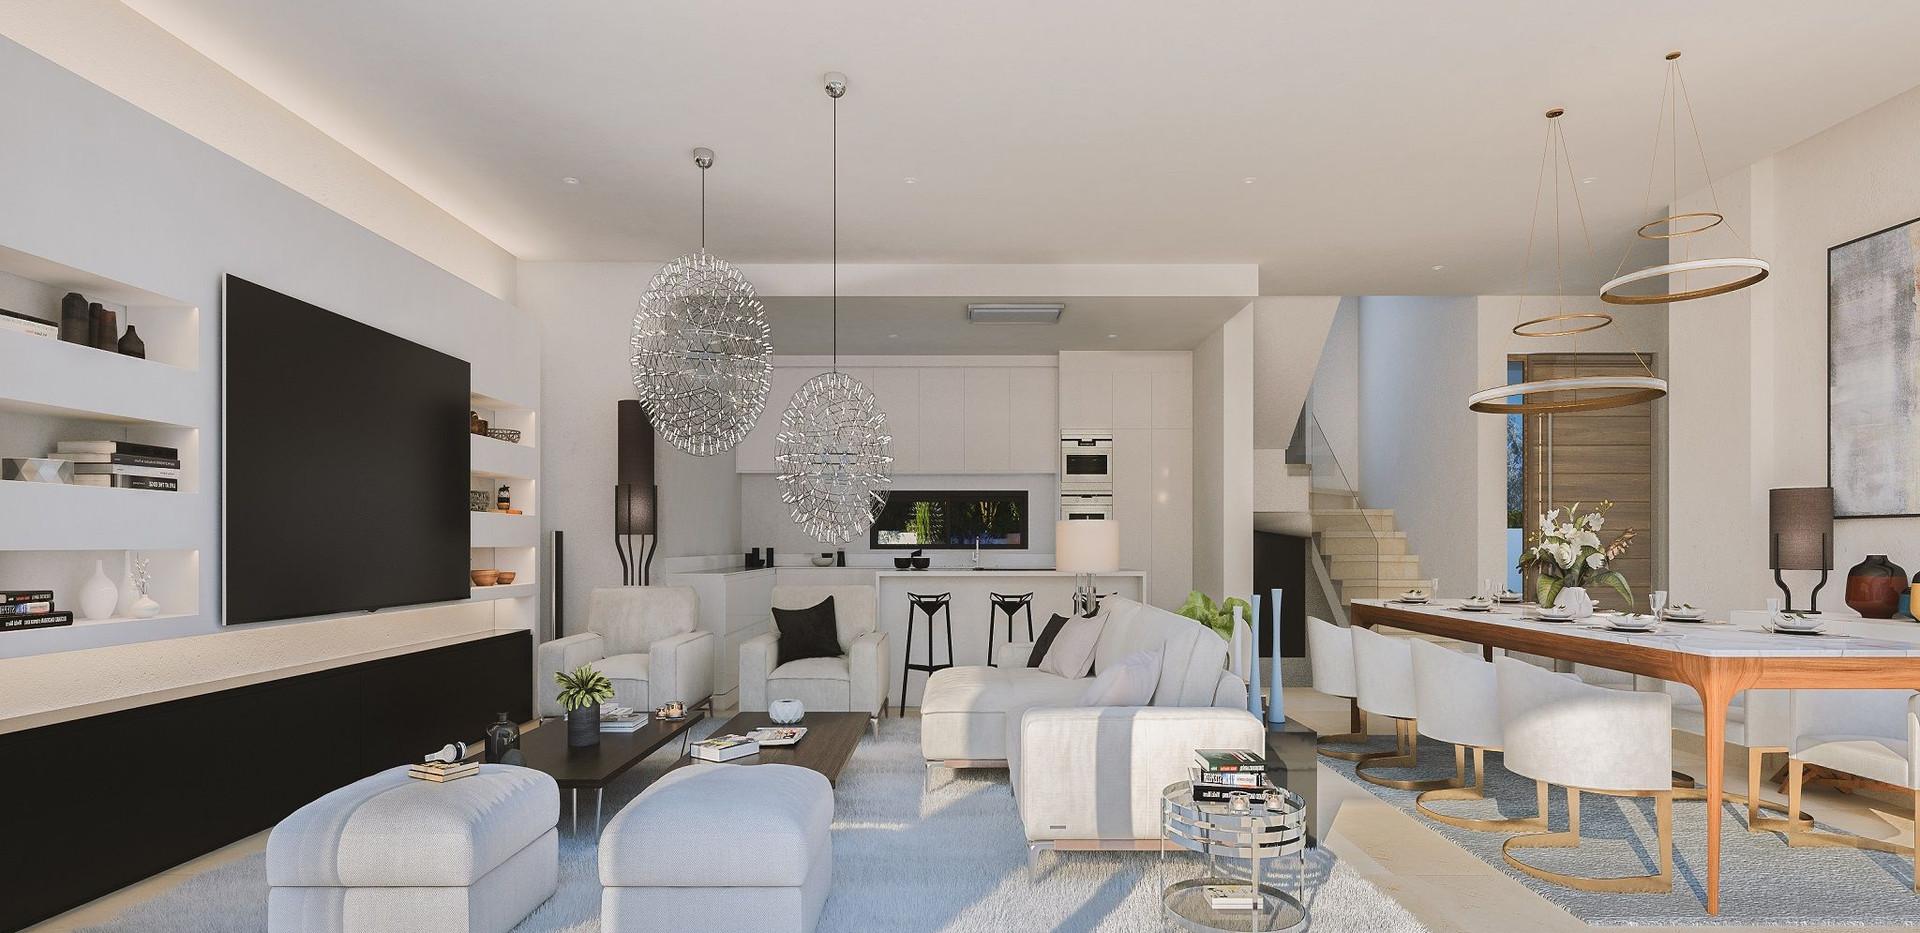 CaboRoyale-Livingroom-Type-A-2.jpg